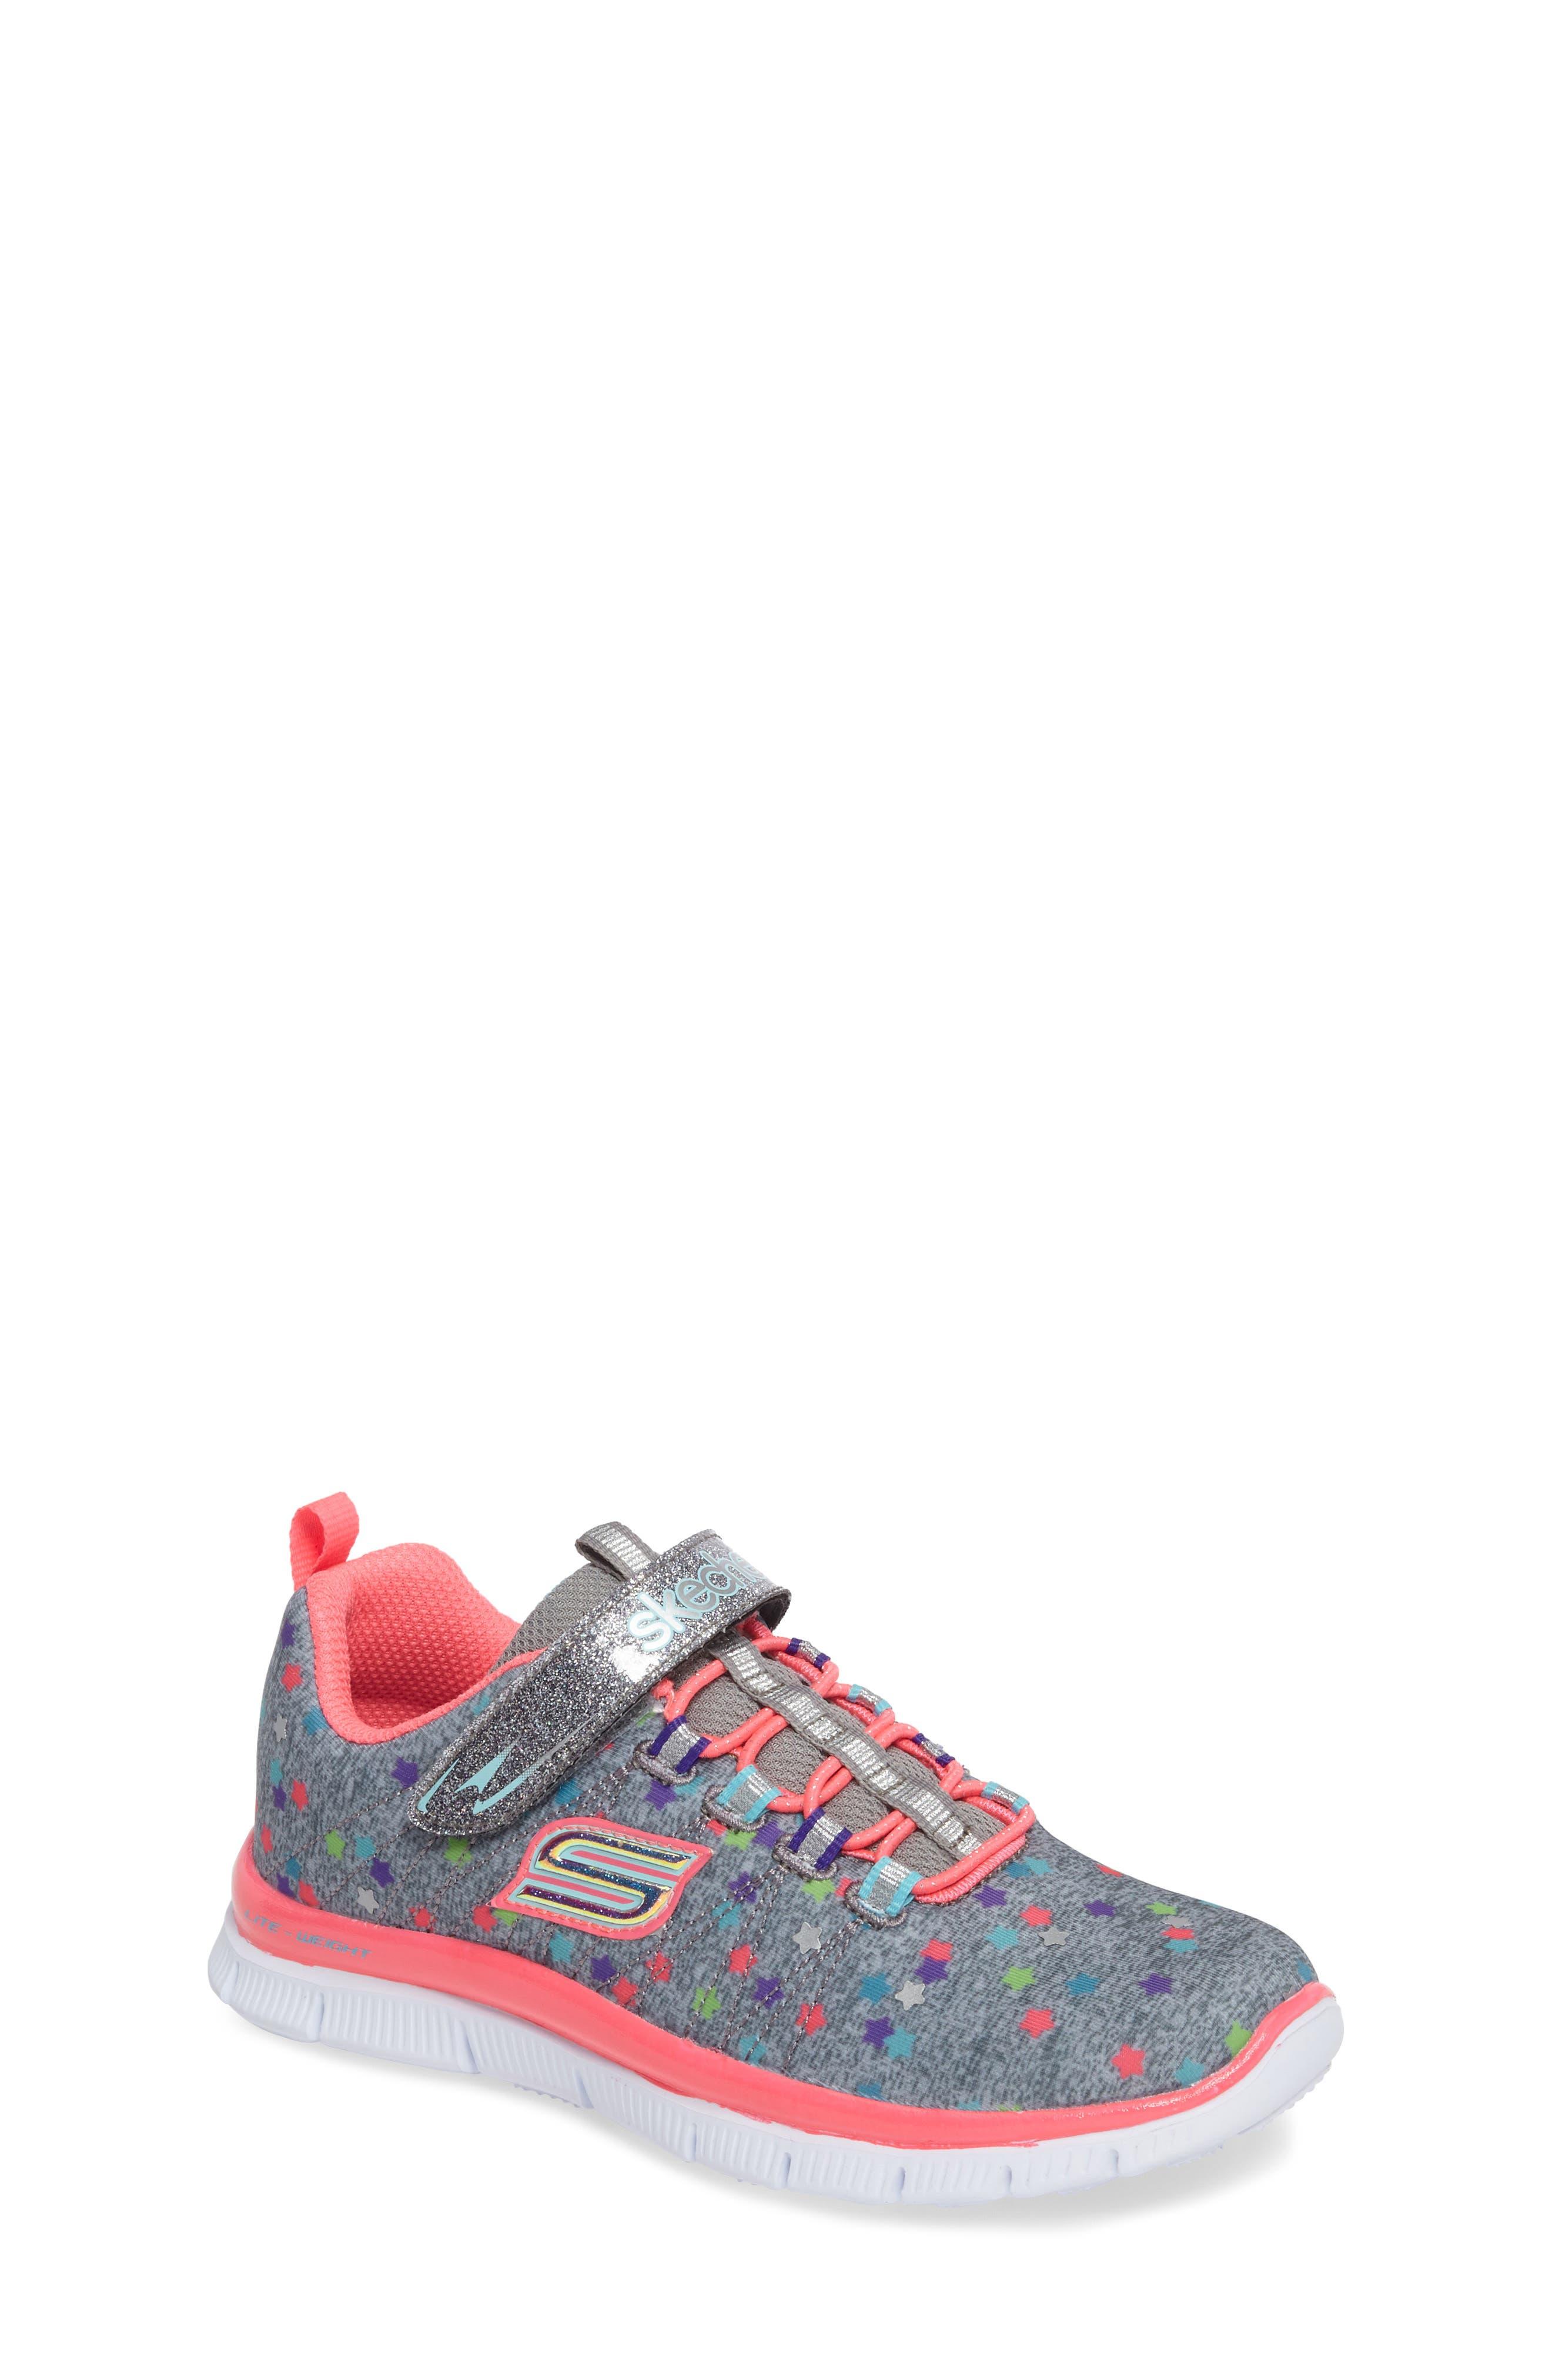 Skech Appeal Star Spirit Sneaker,                             Main thumbnail 1, color,                             020